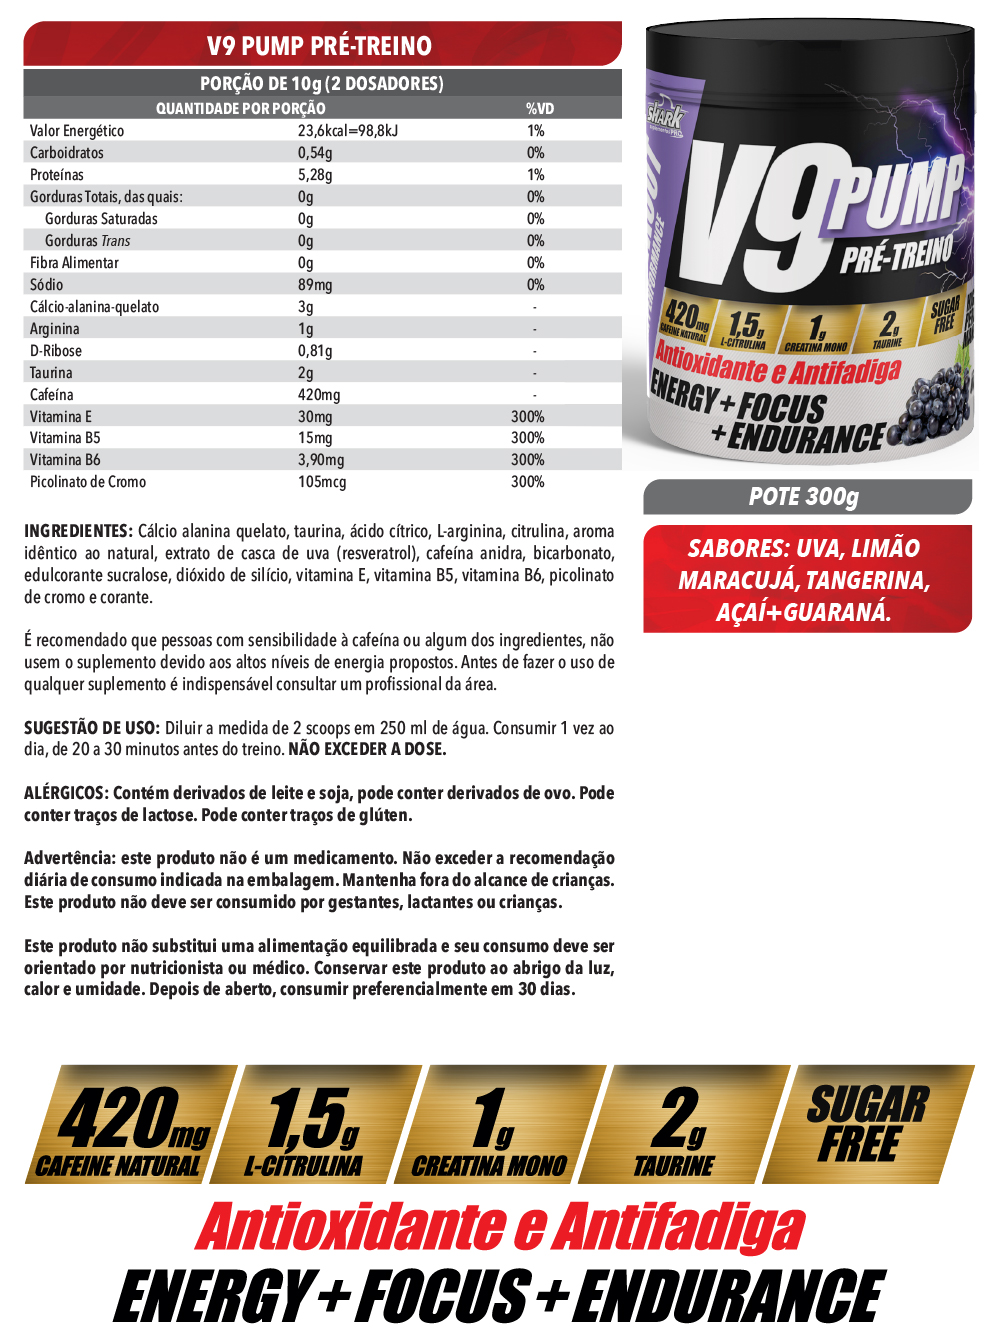 V9 Pump Pré Treino 300g - Maracujá